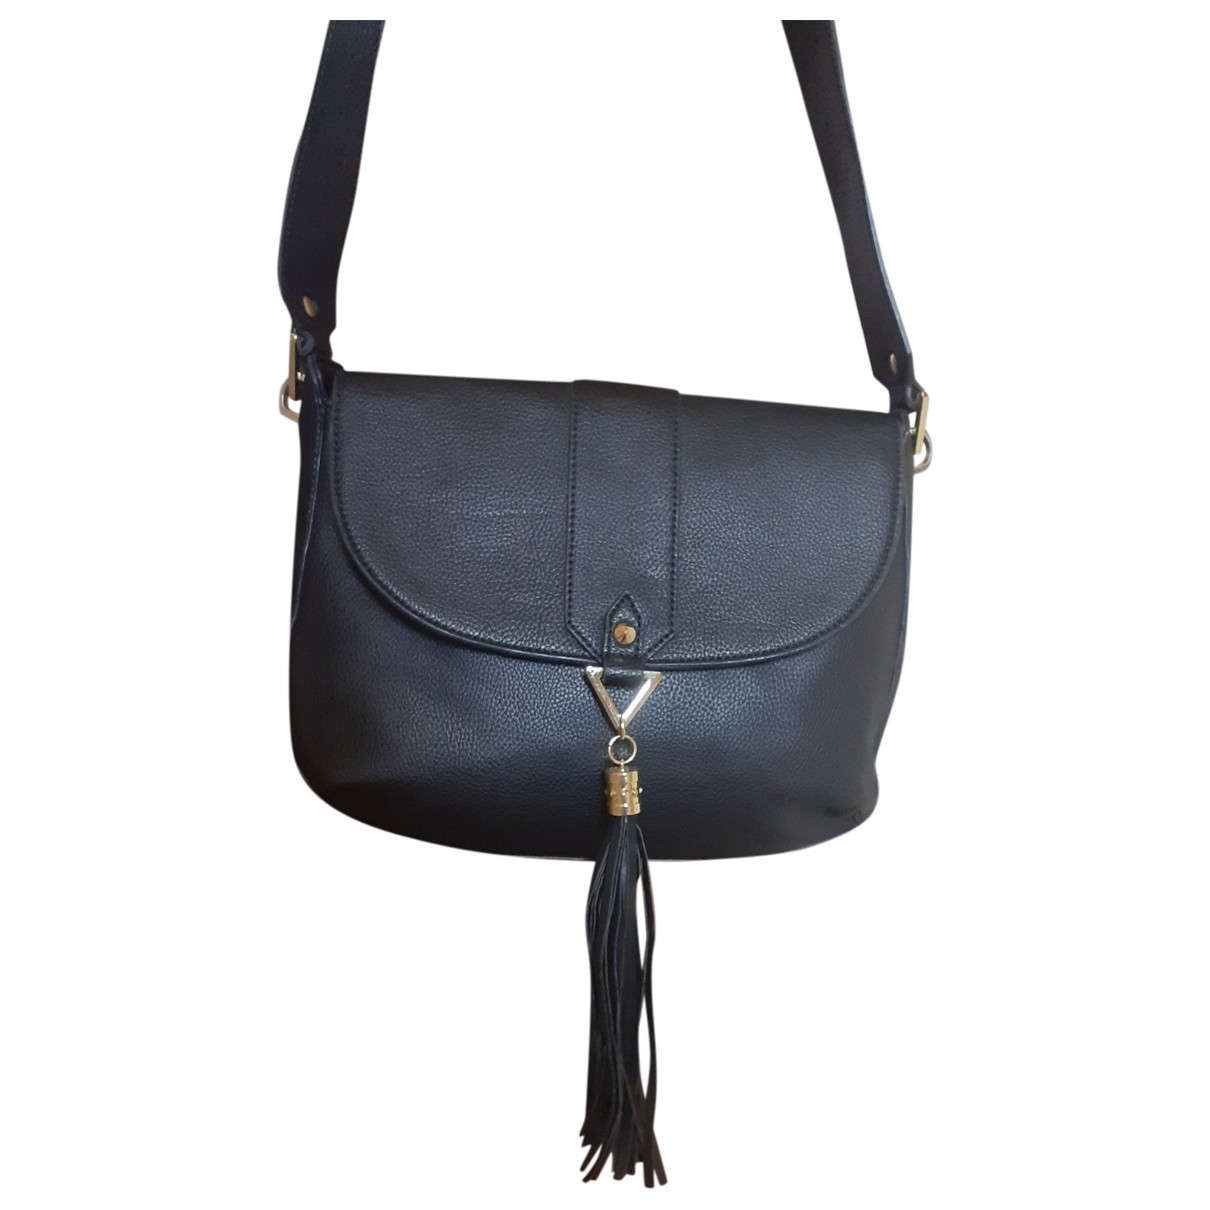 Liu.jo \N Black Leather Clutch bag for Women \N